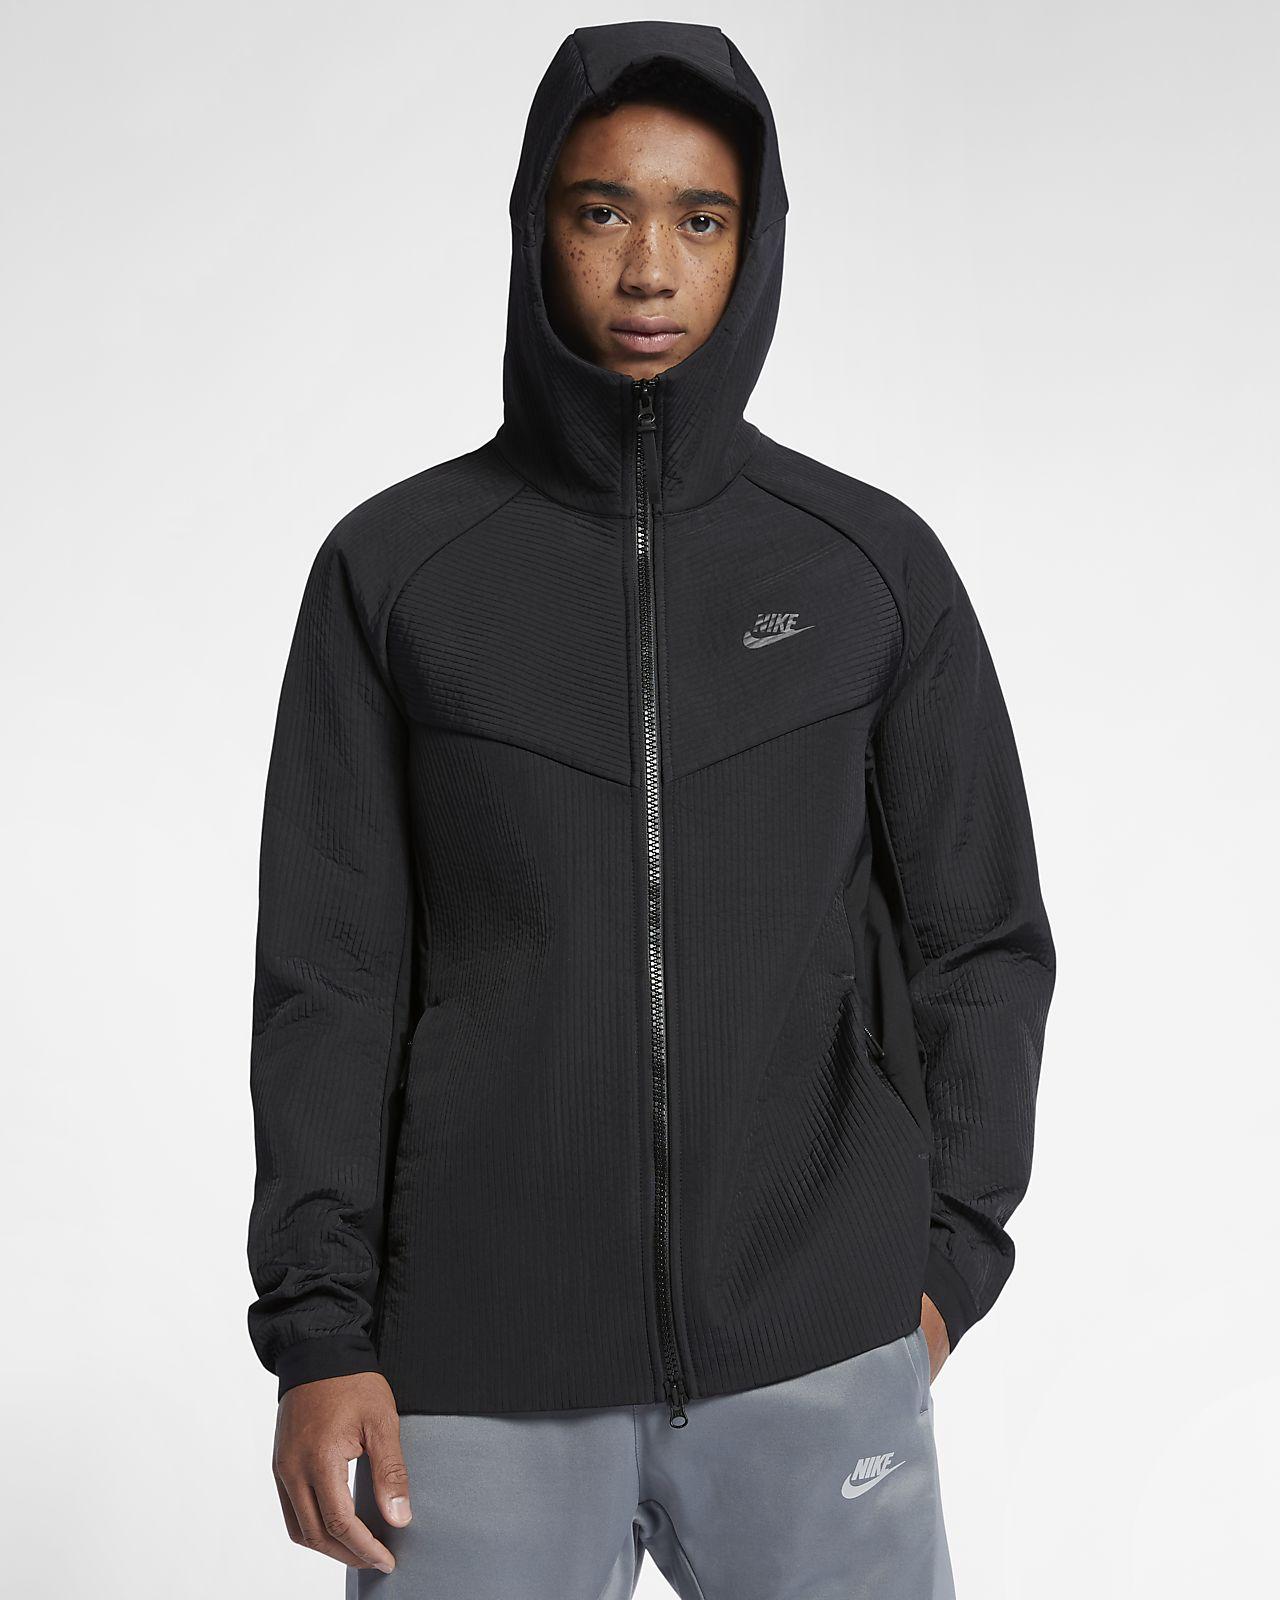 Pour Sportswear Homme Pack Veste Tech Be Nike w7qxUUOI